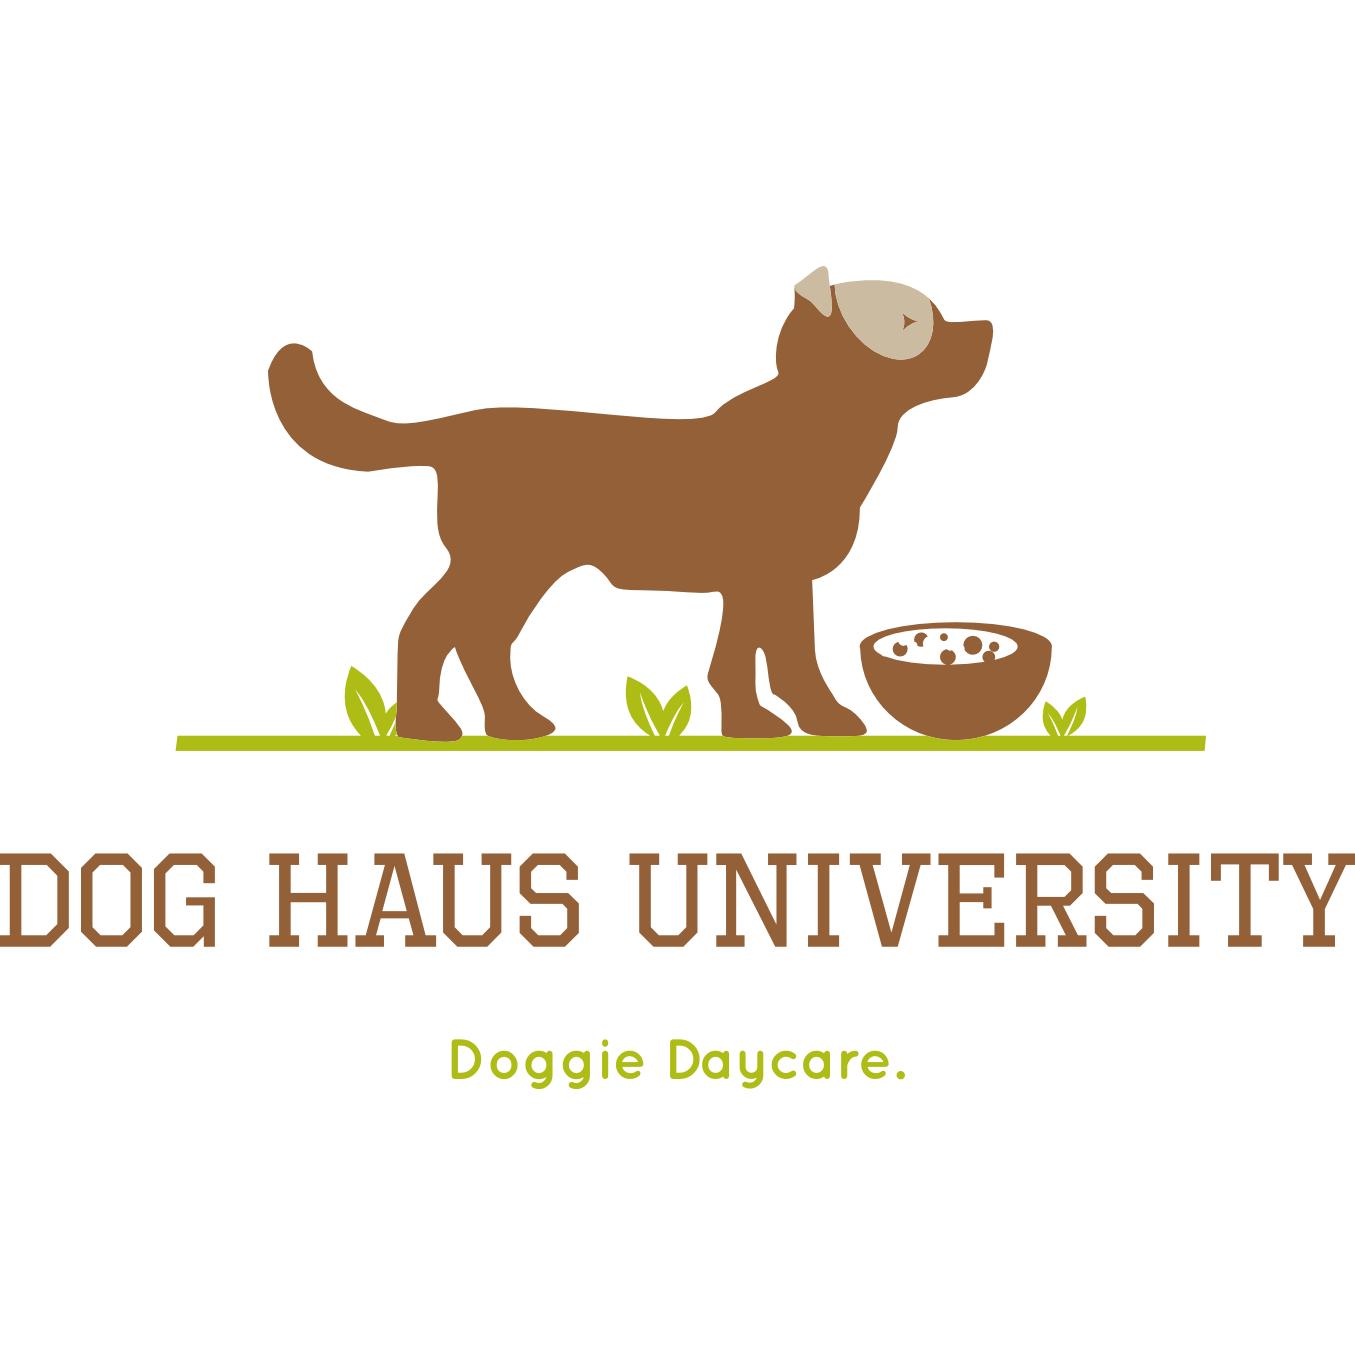 dog haus university in madison wi 53703. Black Bedroom Furniture Sets. Home Design Ideas